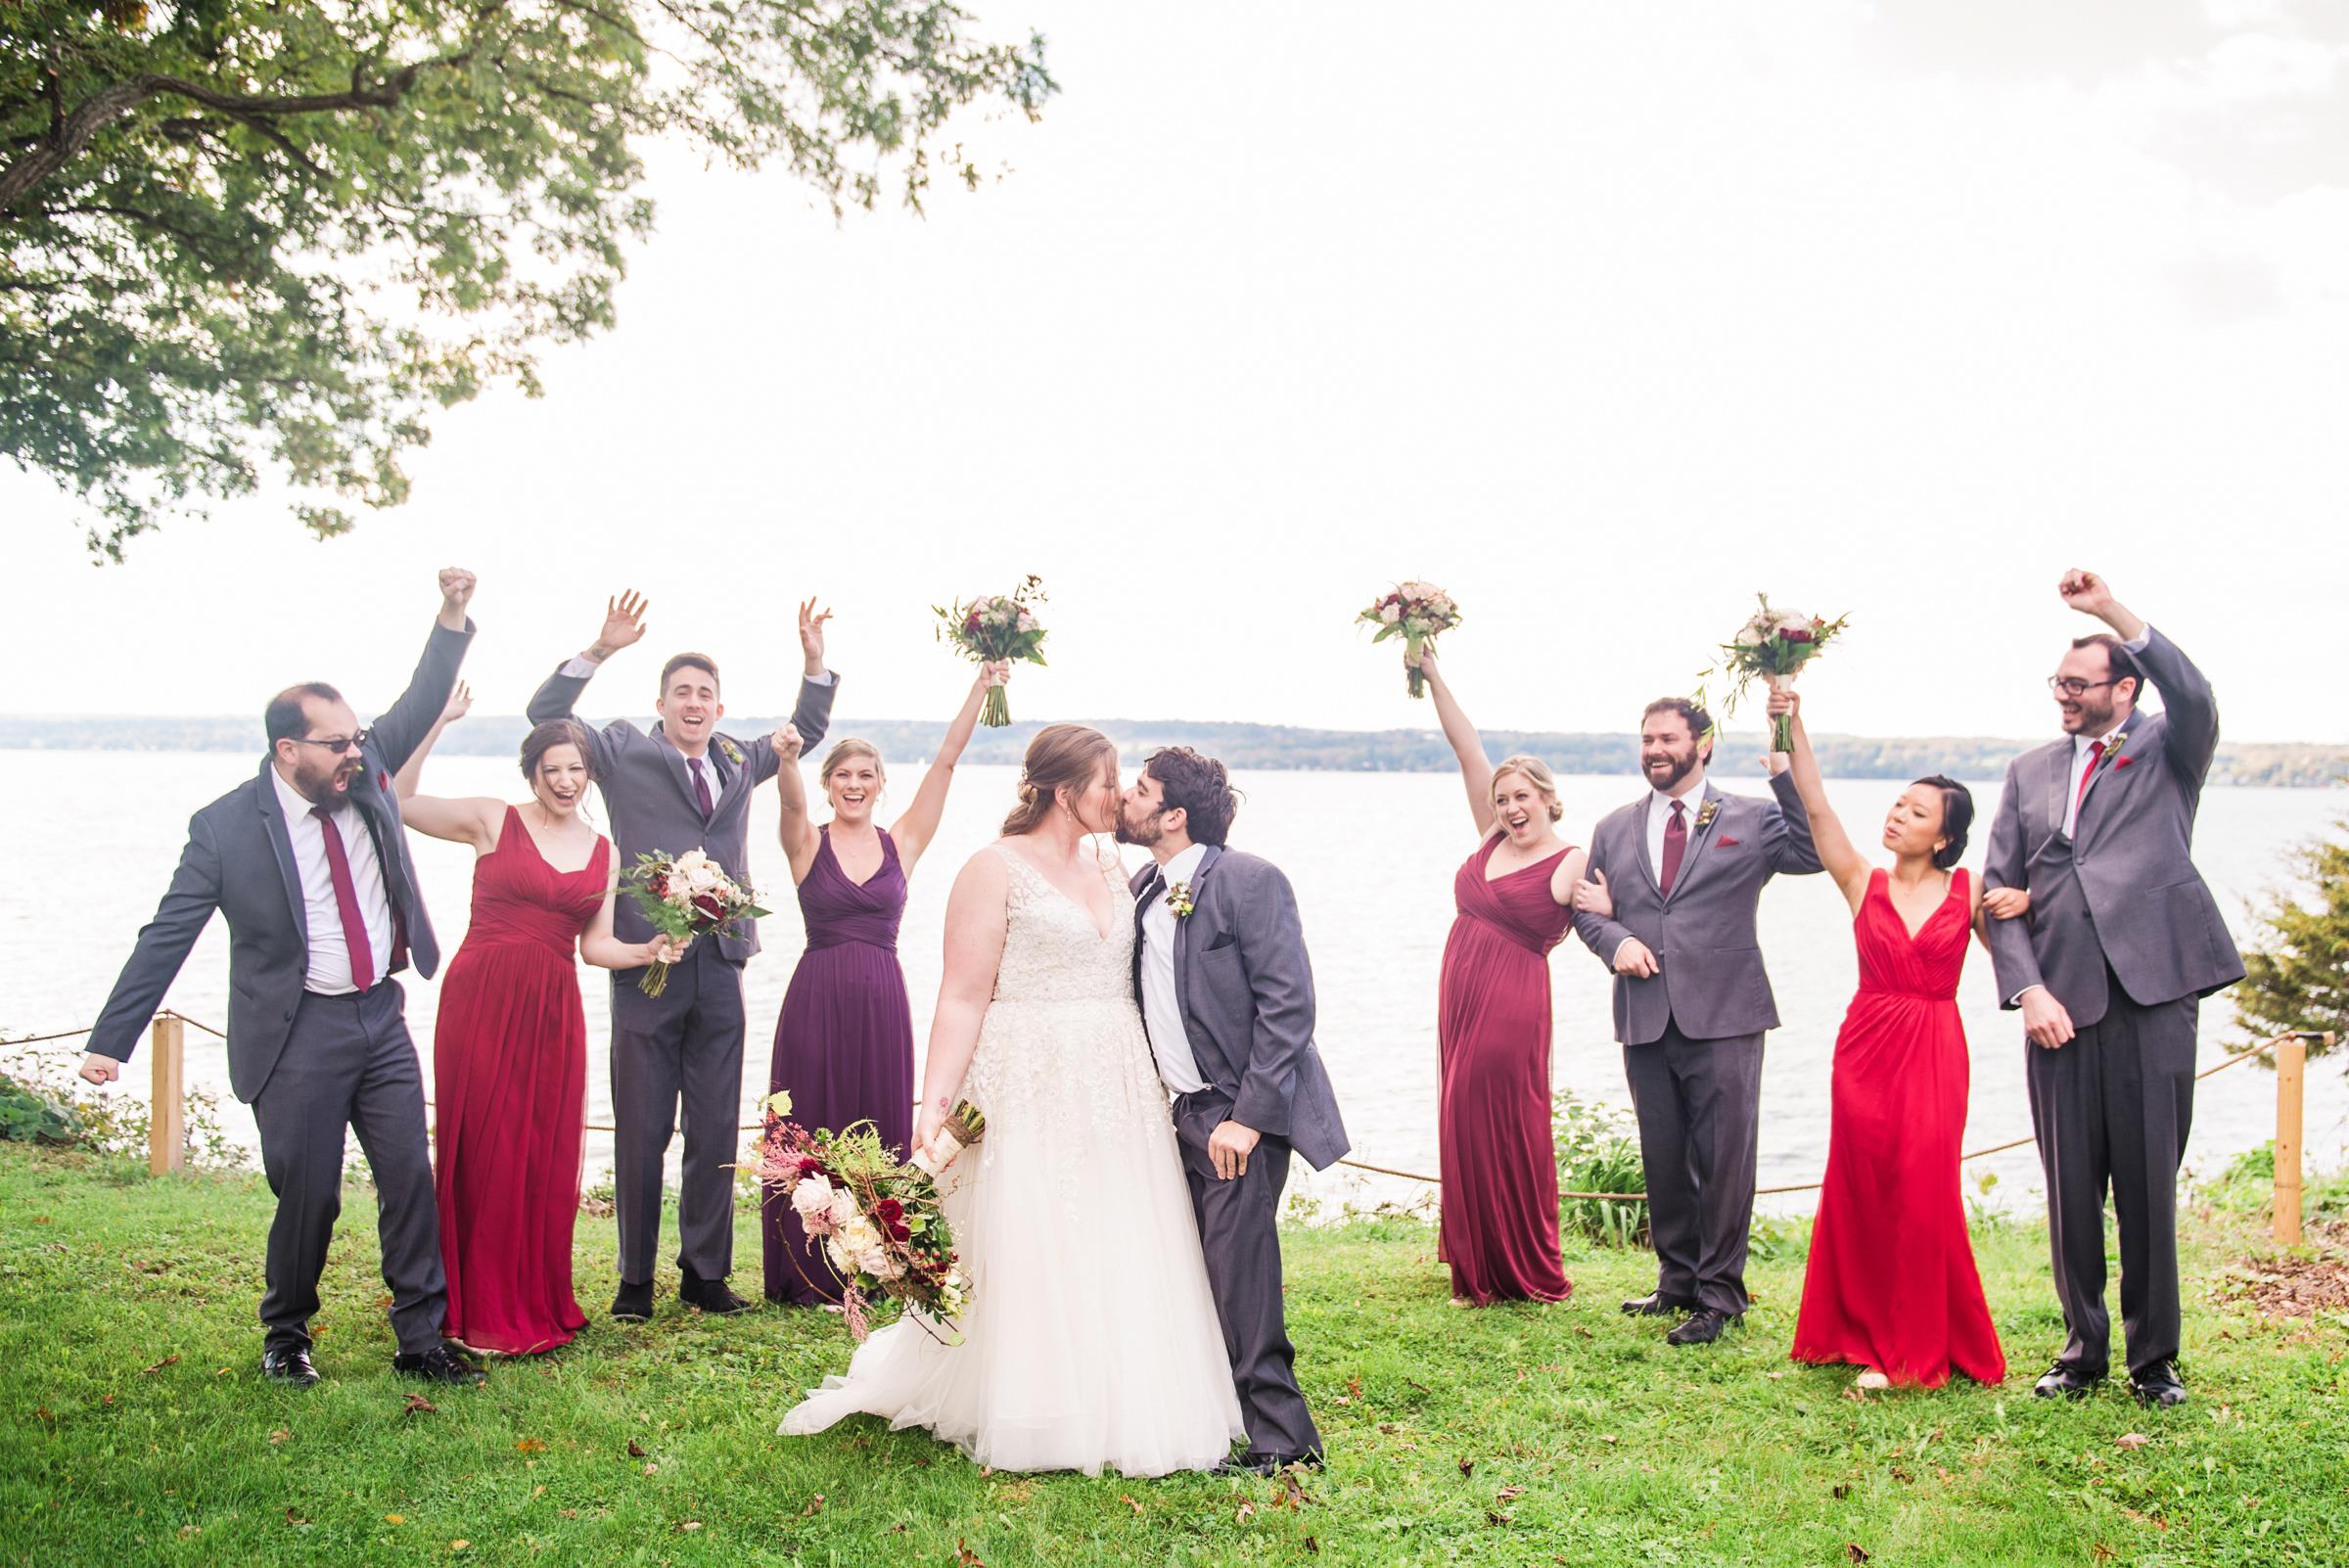 Zugibe_Vineyards_Finger_Lakes_Wedding_JILL_STUDIO_Rochester_NY_Photographer_DSC_3602.jpg